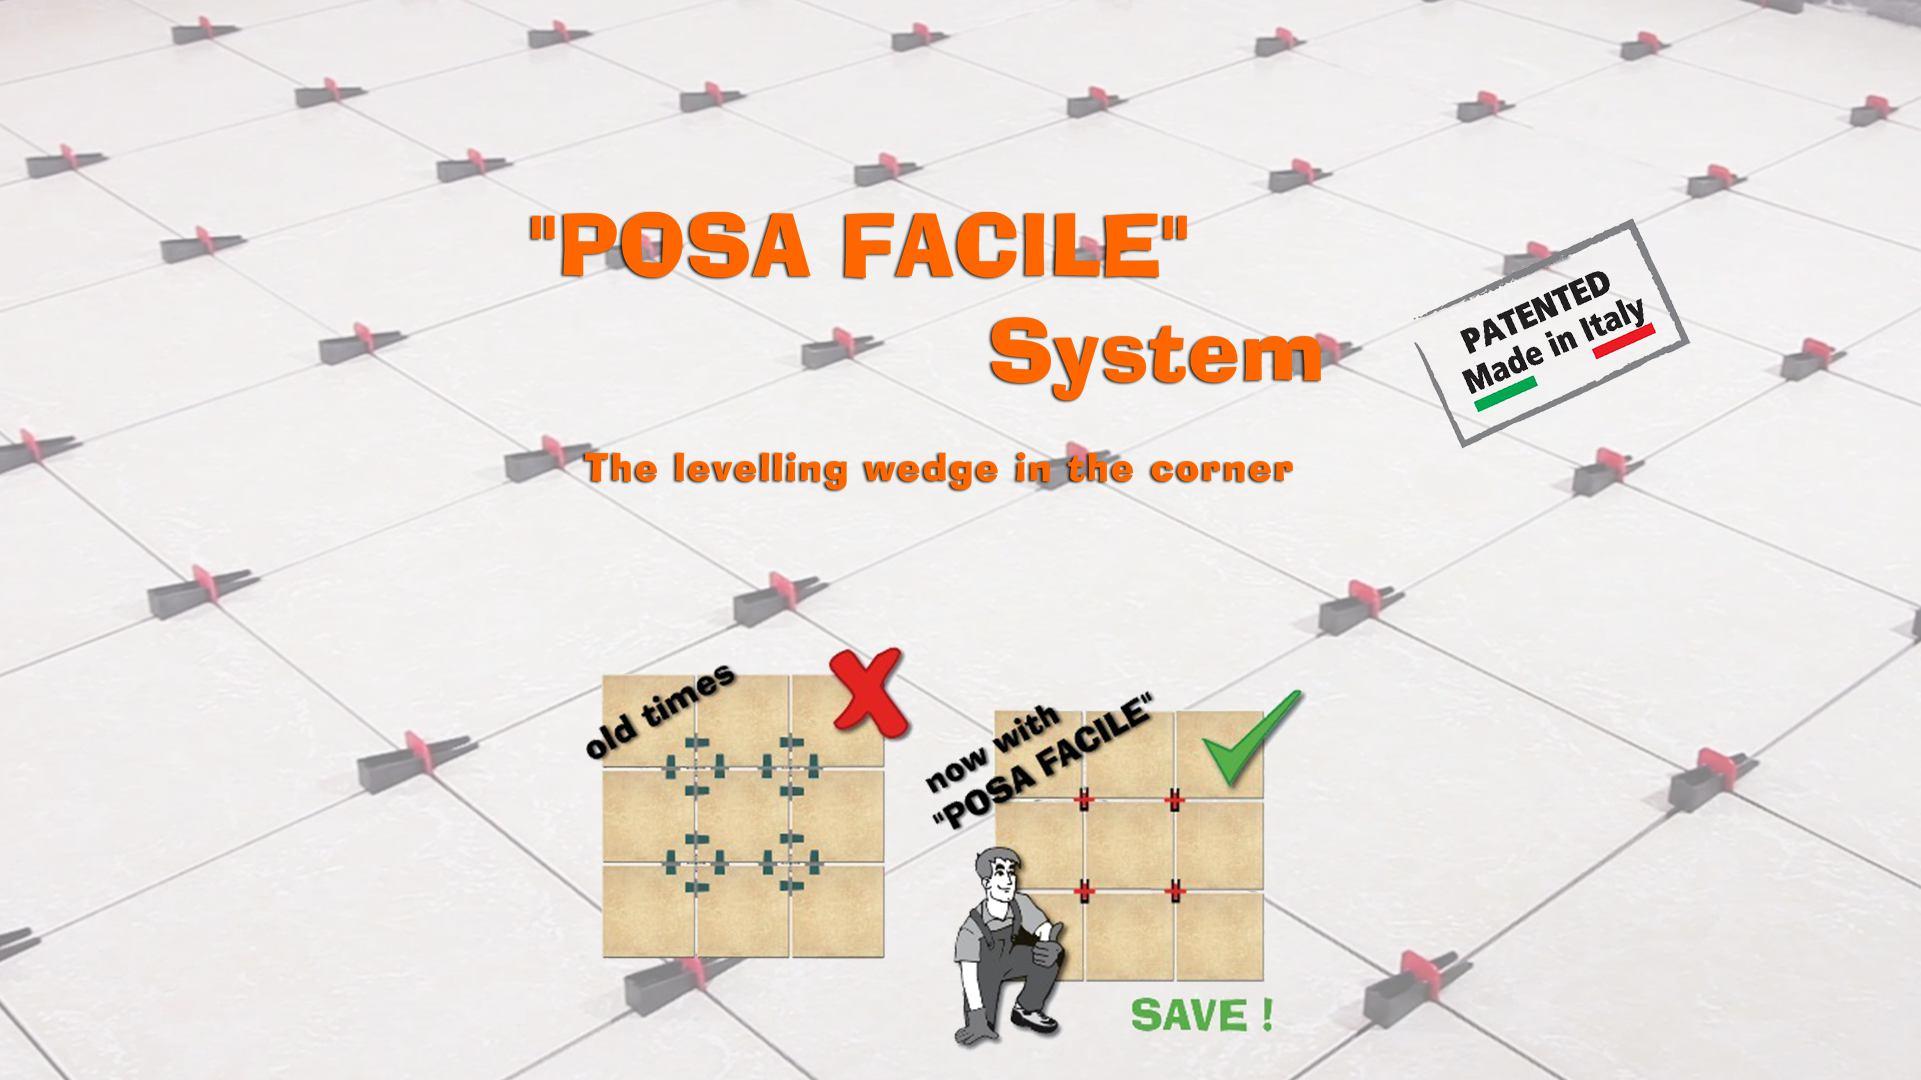 Posa Facile System